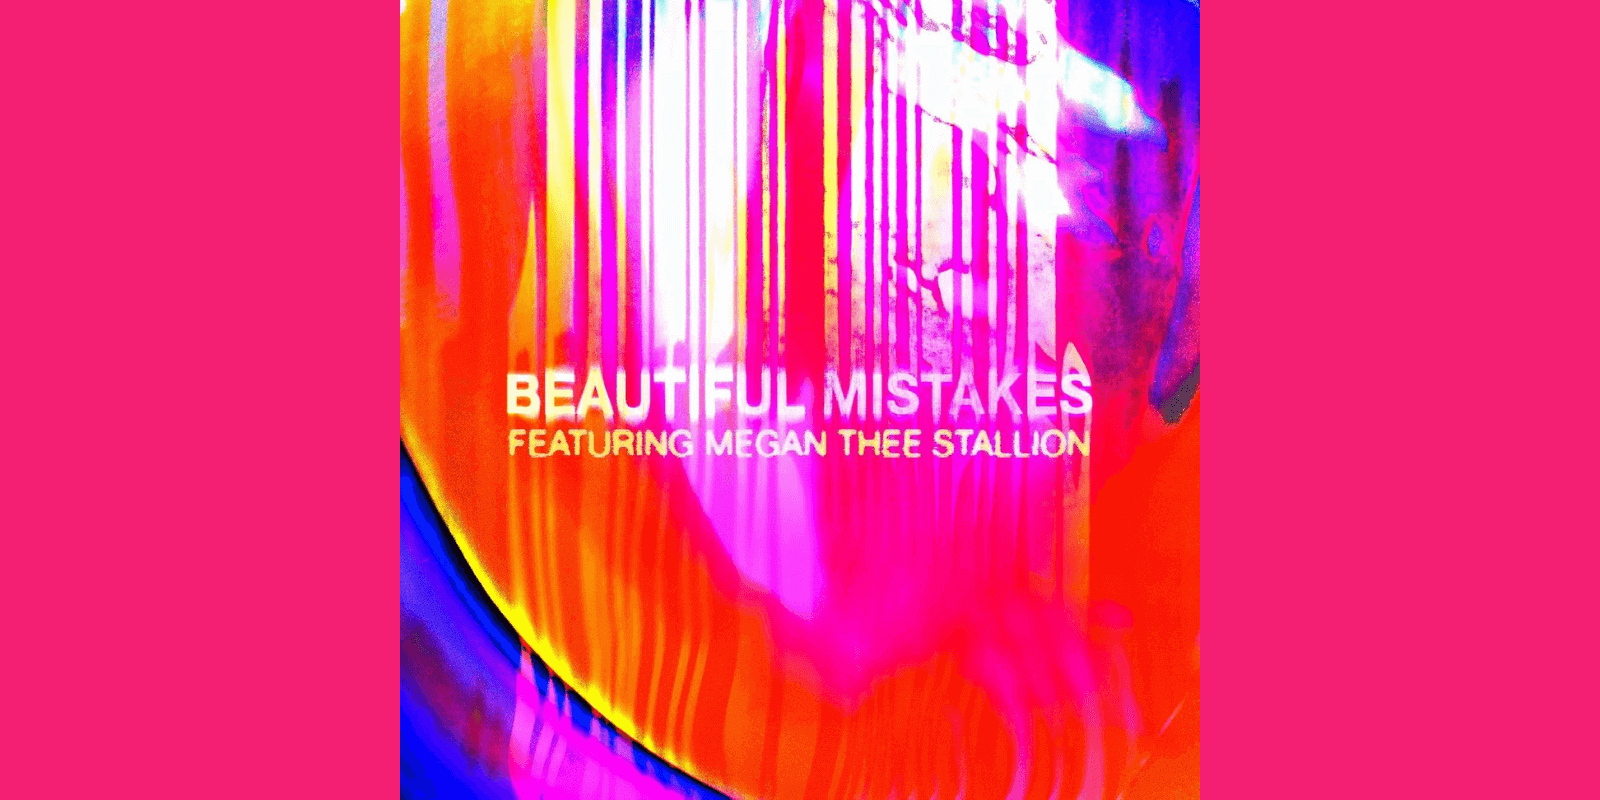 Beautiful Mistakes by Maroon 5 ft. Megan Thee Stallion